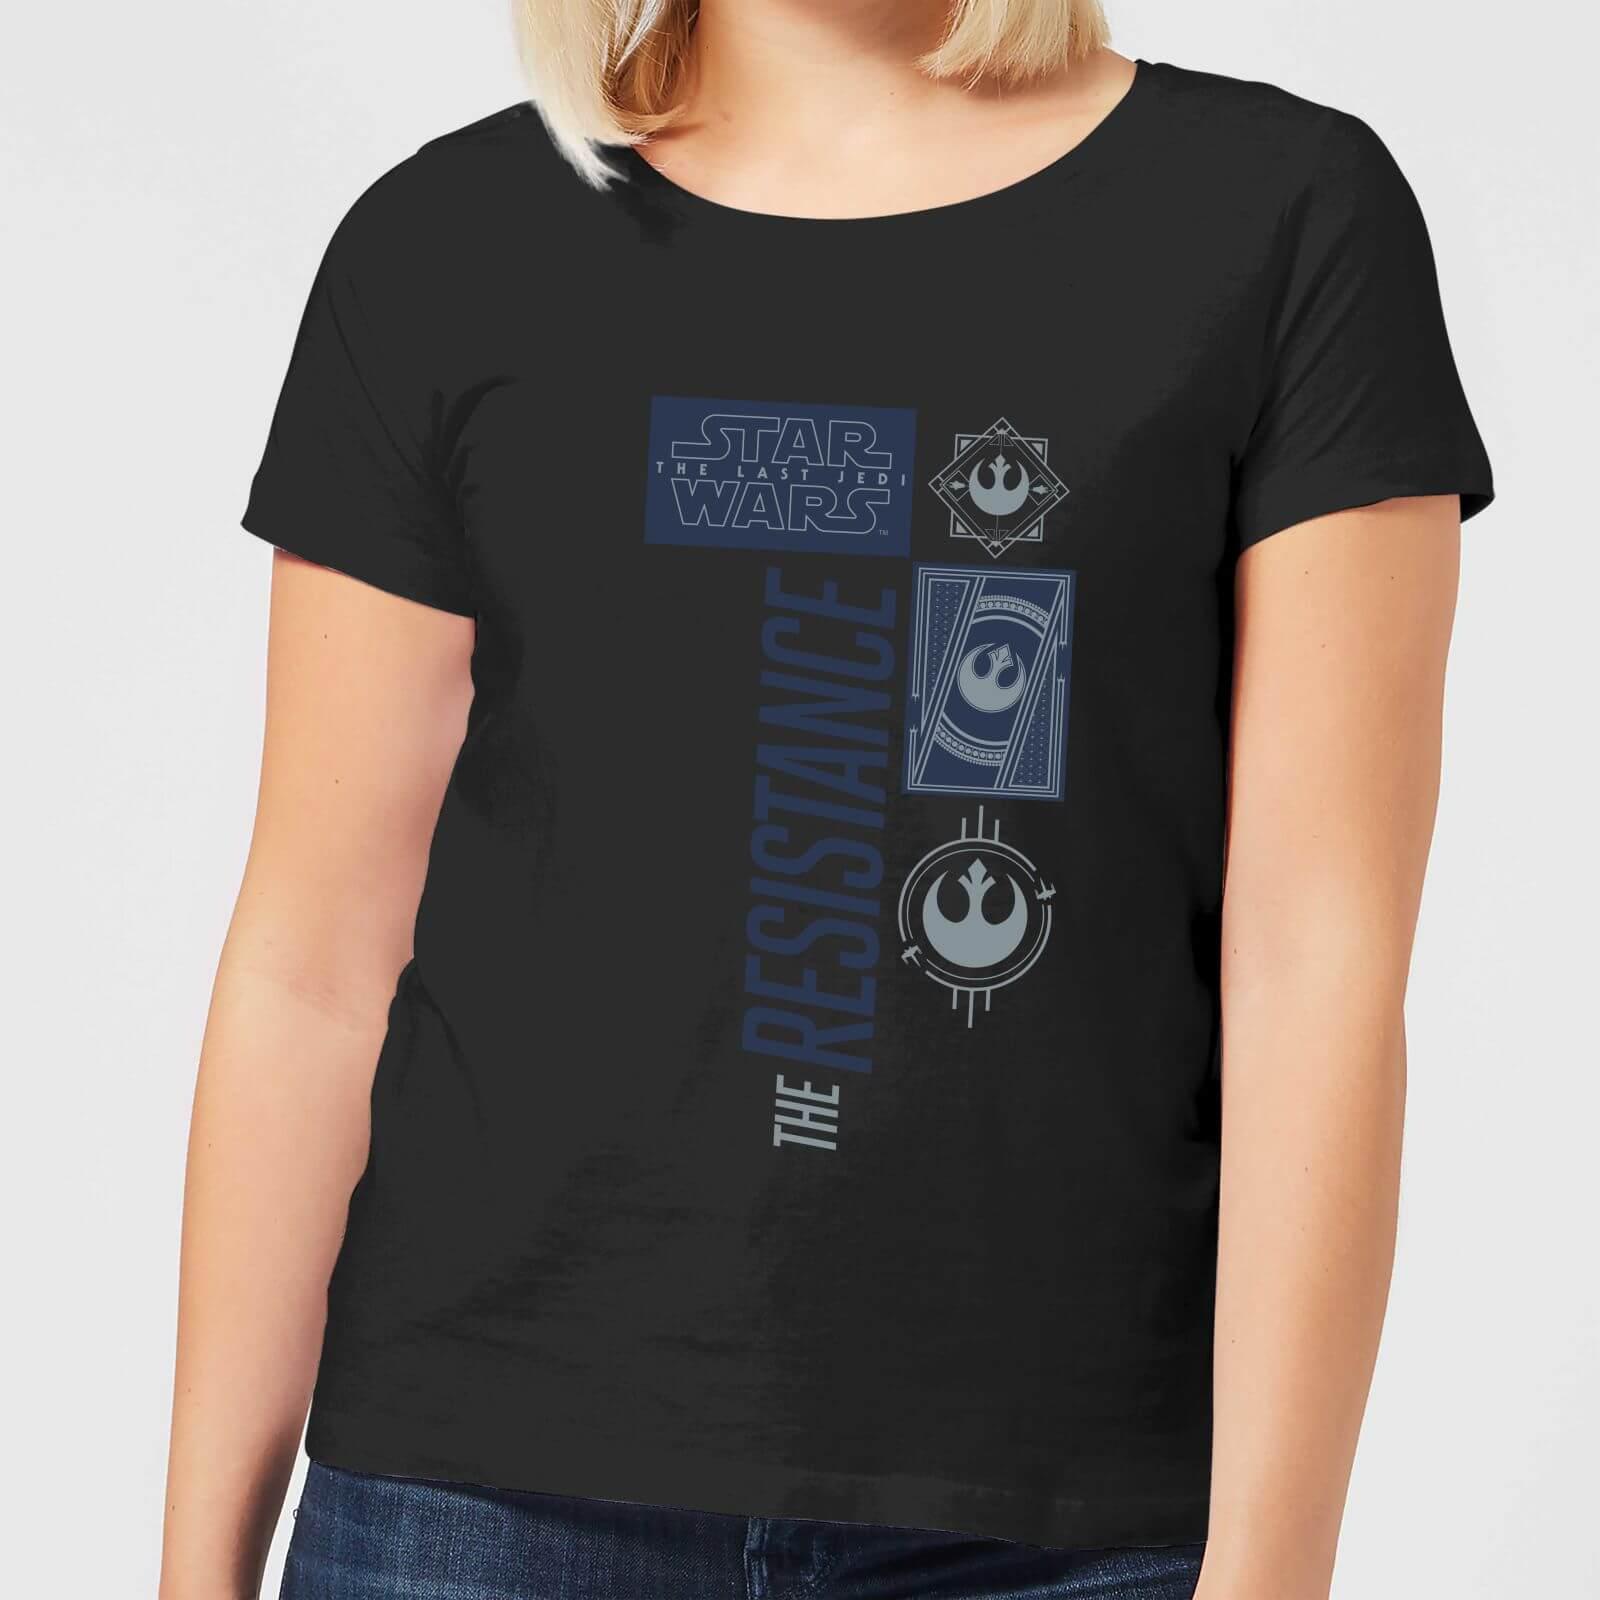 663ae997aead Star Wars The Resistance Black Women s T-Shirt - Black. Description